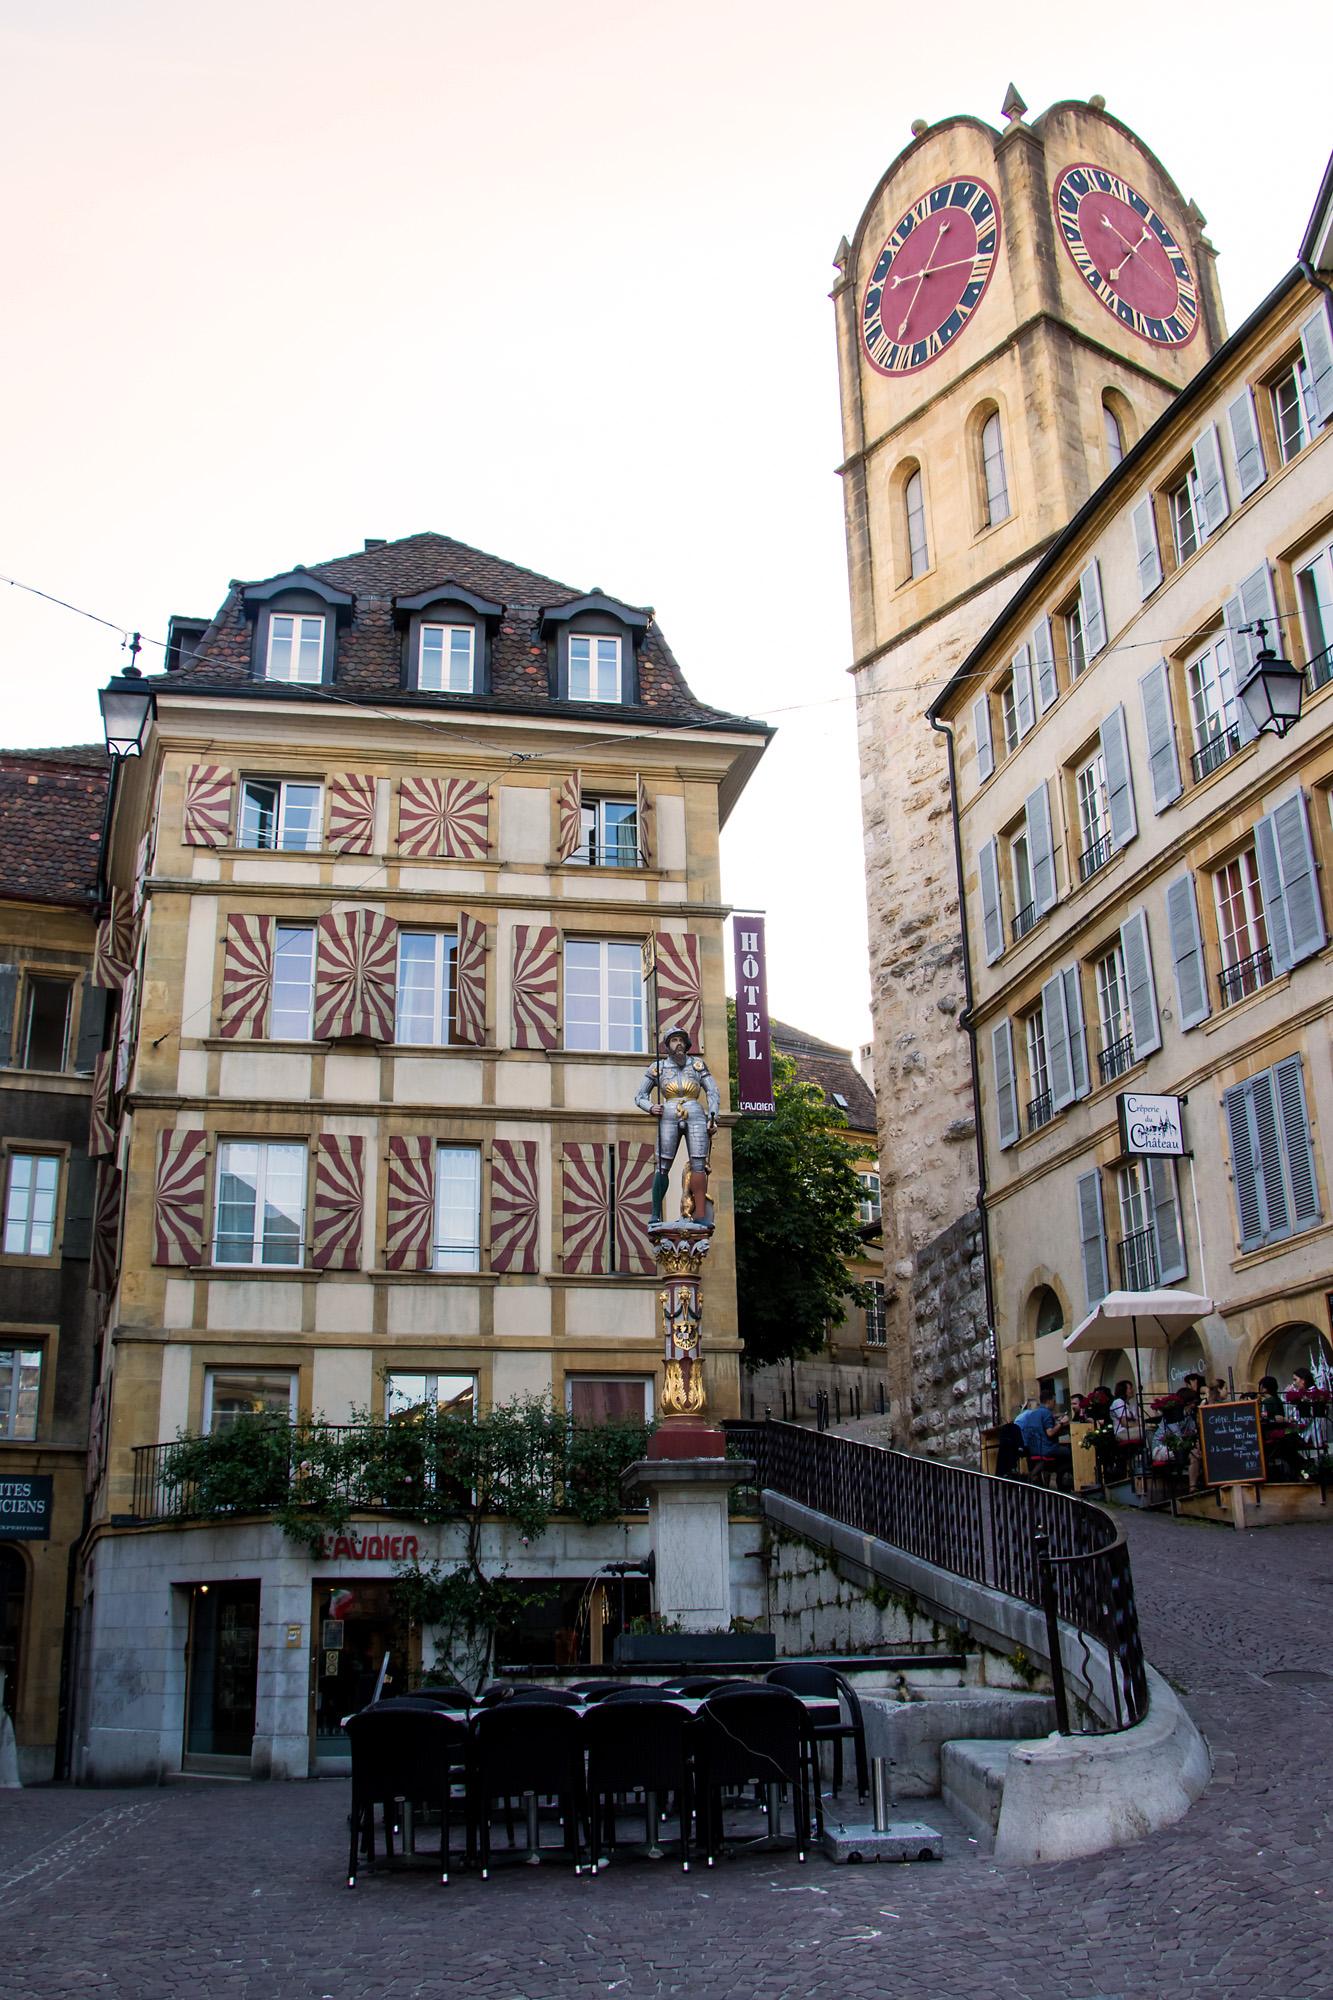 Bannerträger-Brunnen mit dem Tour de Diesse